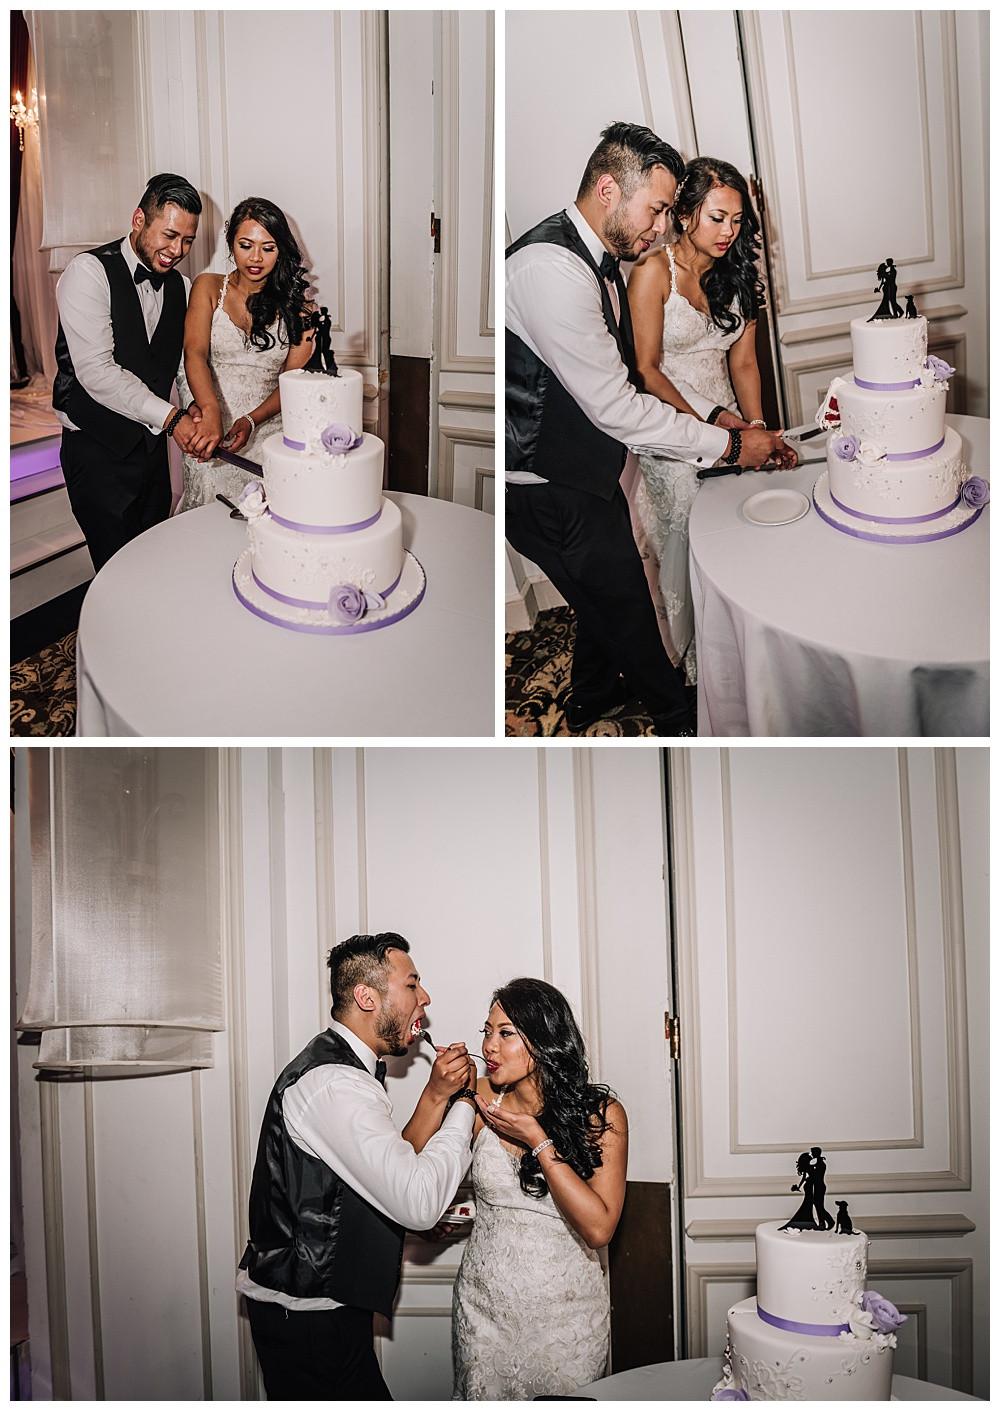 Cake Cutting, Bride and Groom, Cake